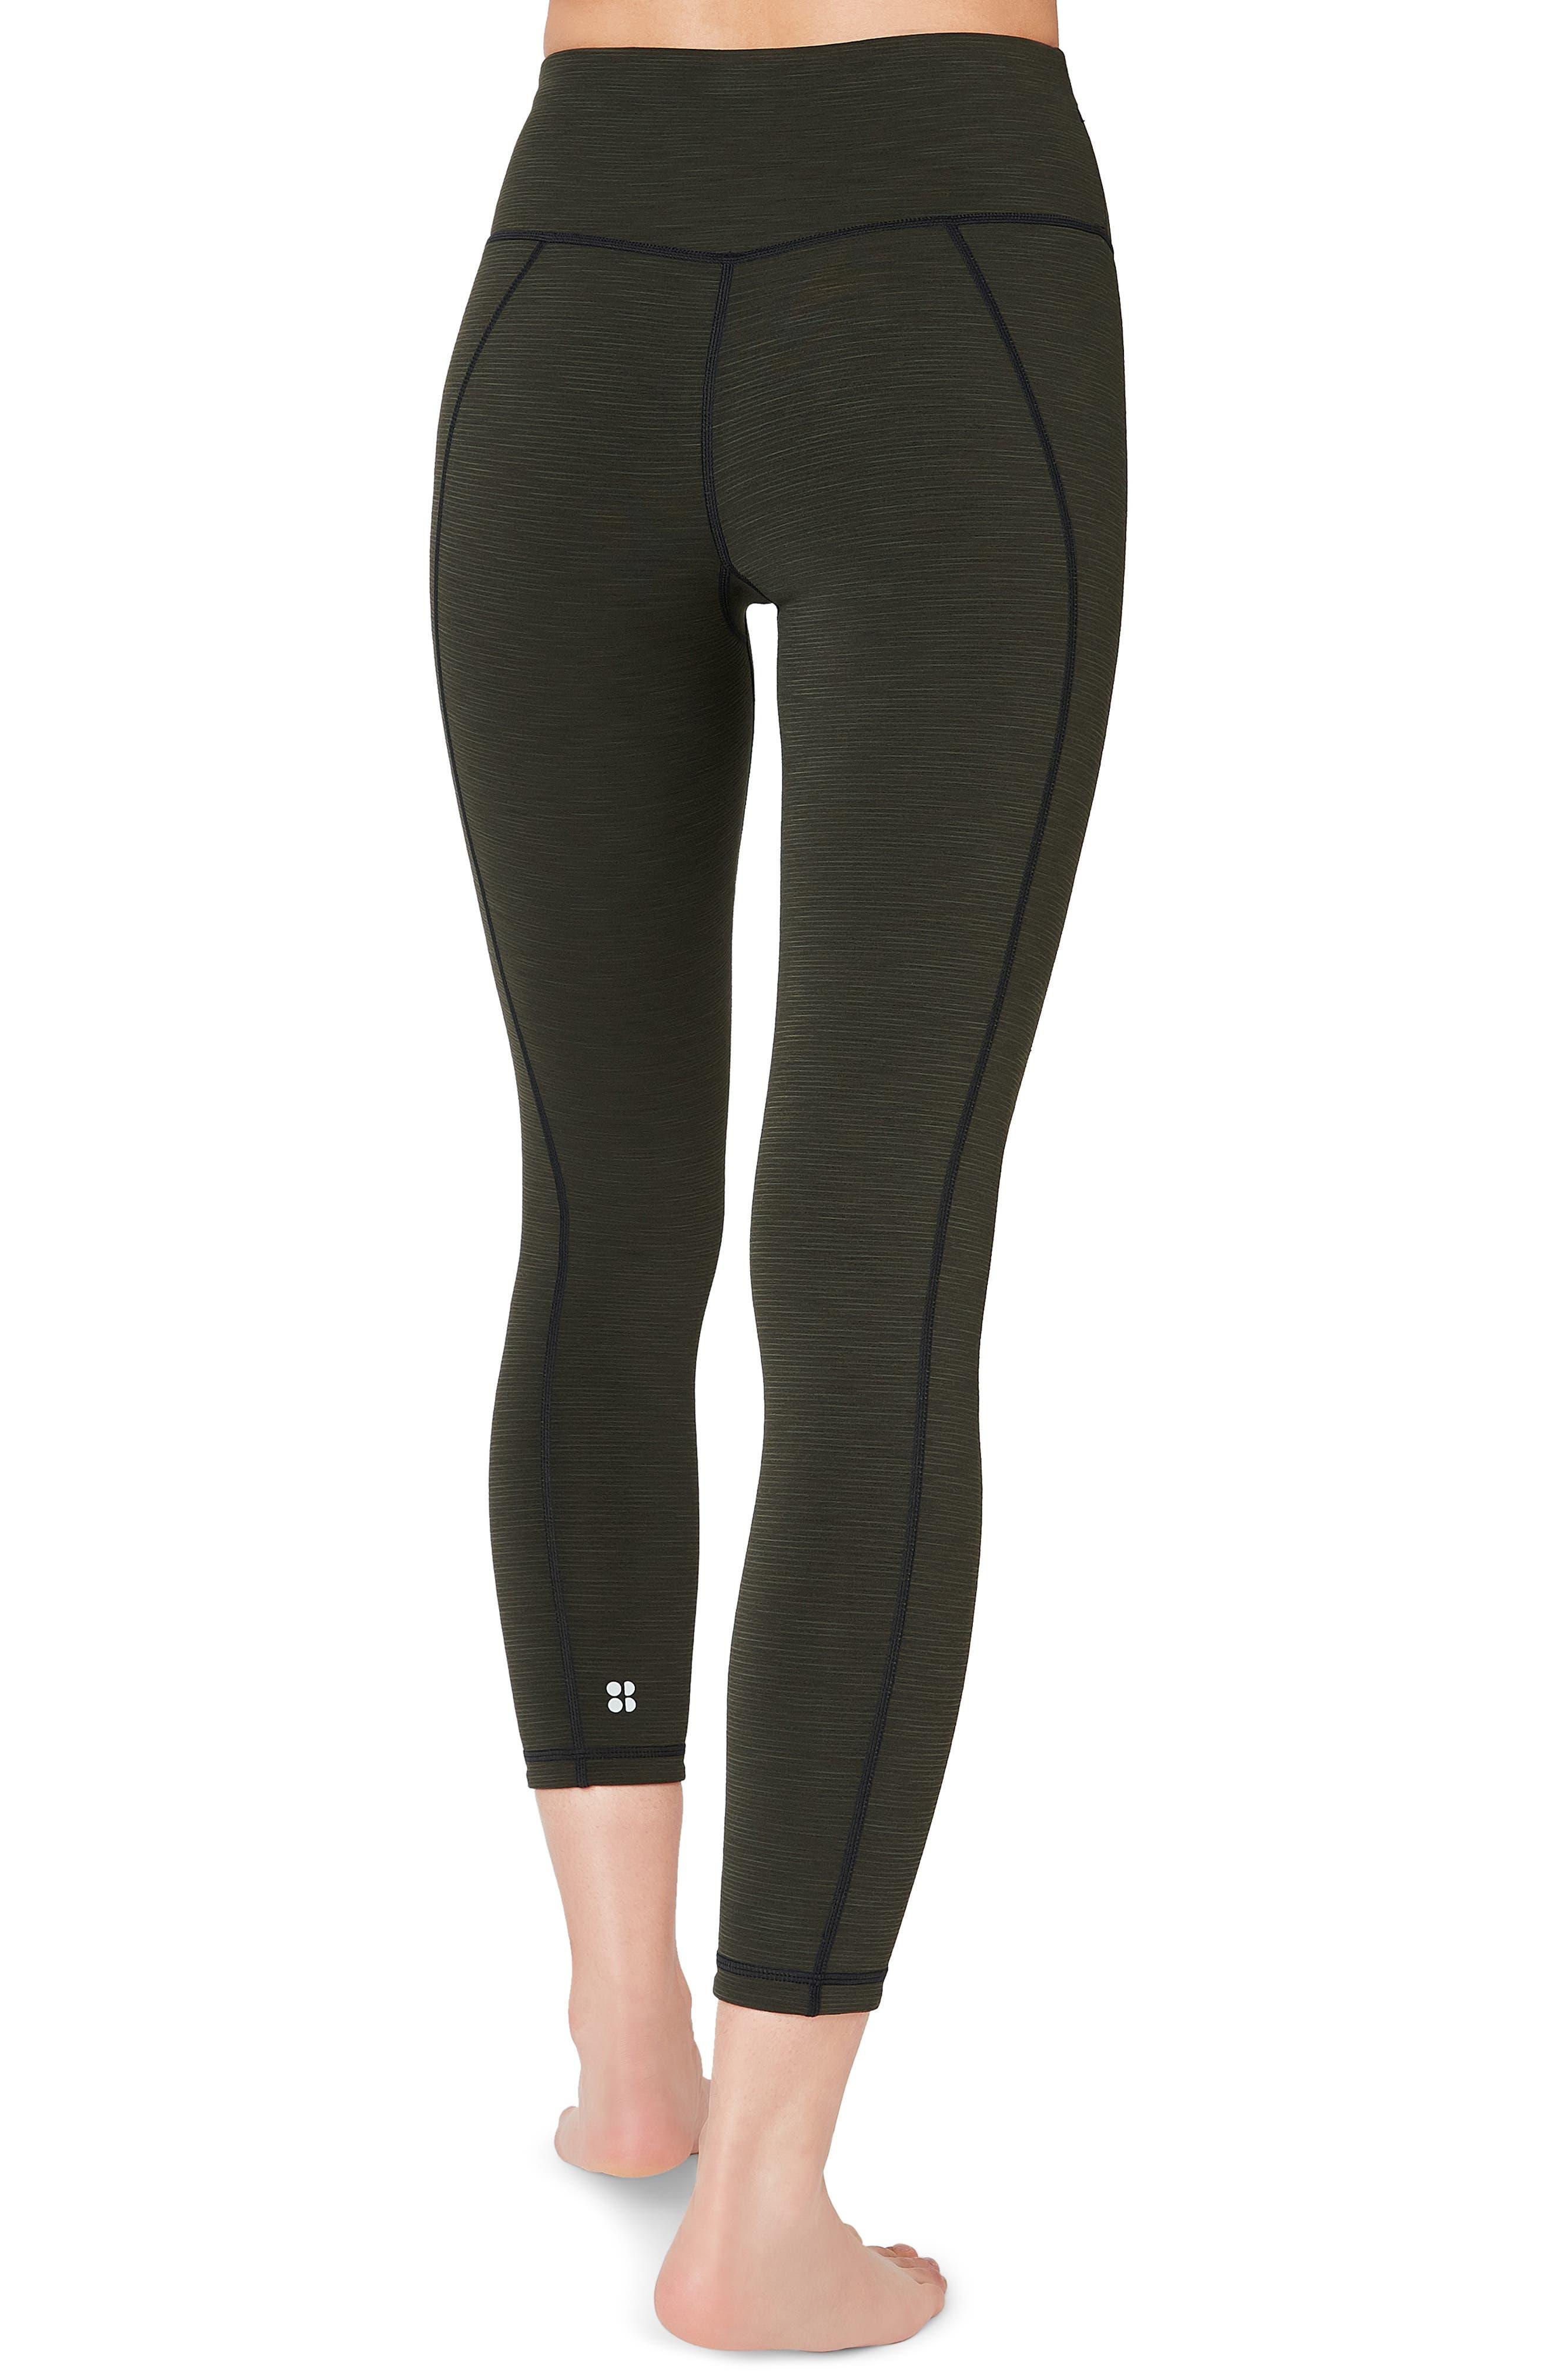 SWEATY BETTY, Reversible Yoga Leggings, Alternate thumbnail 2, color, 300